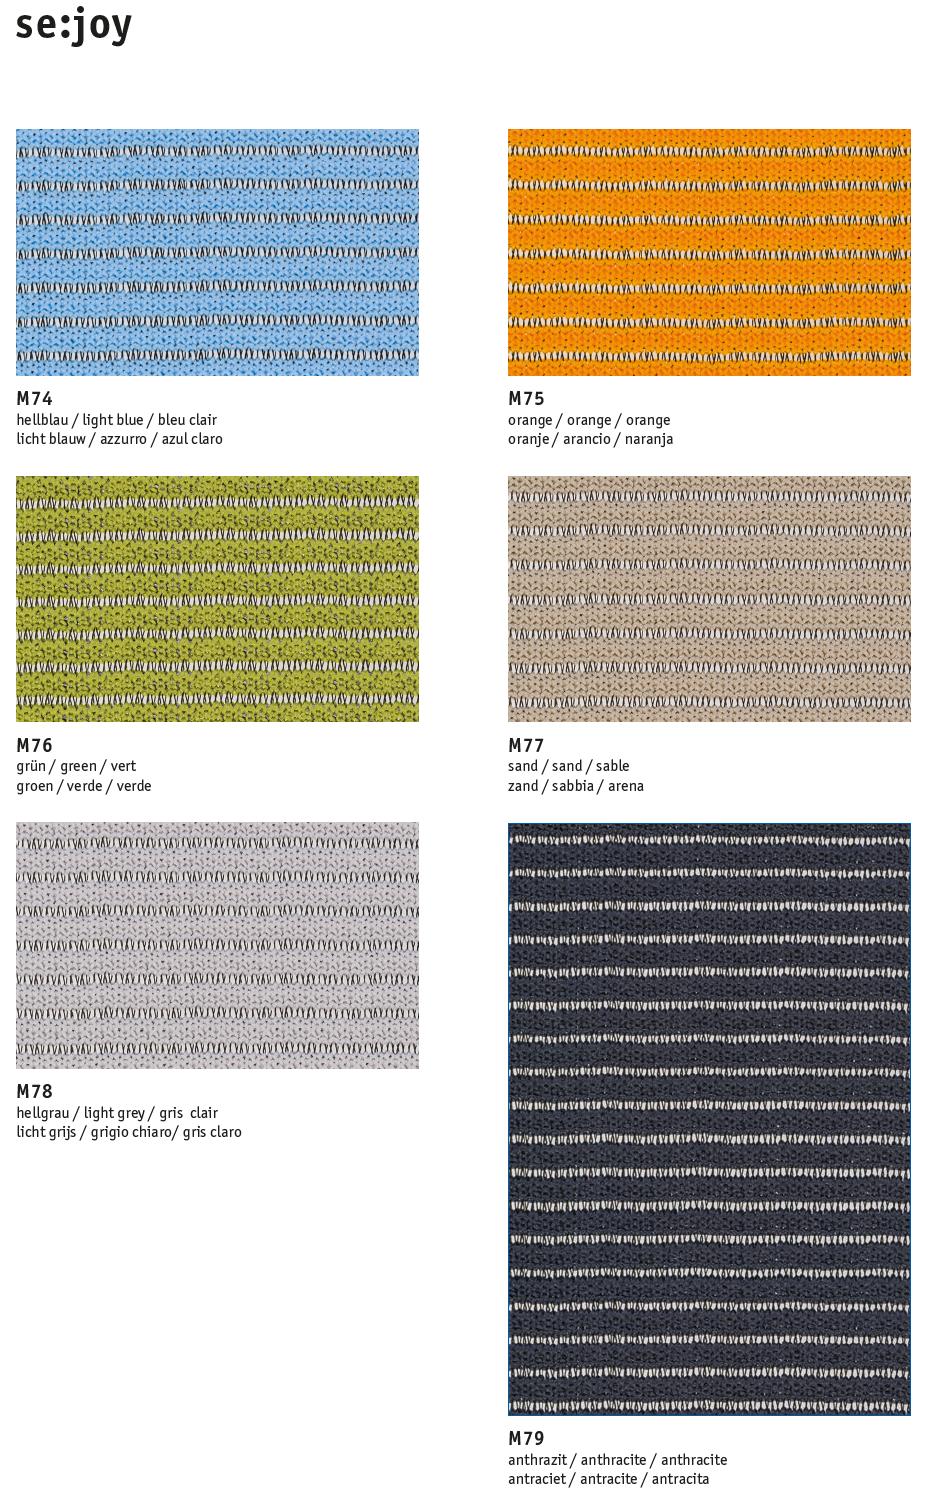 Tapizados de colores Silla Giratoria Se:joy ec-180 de Sedus